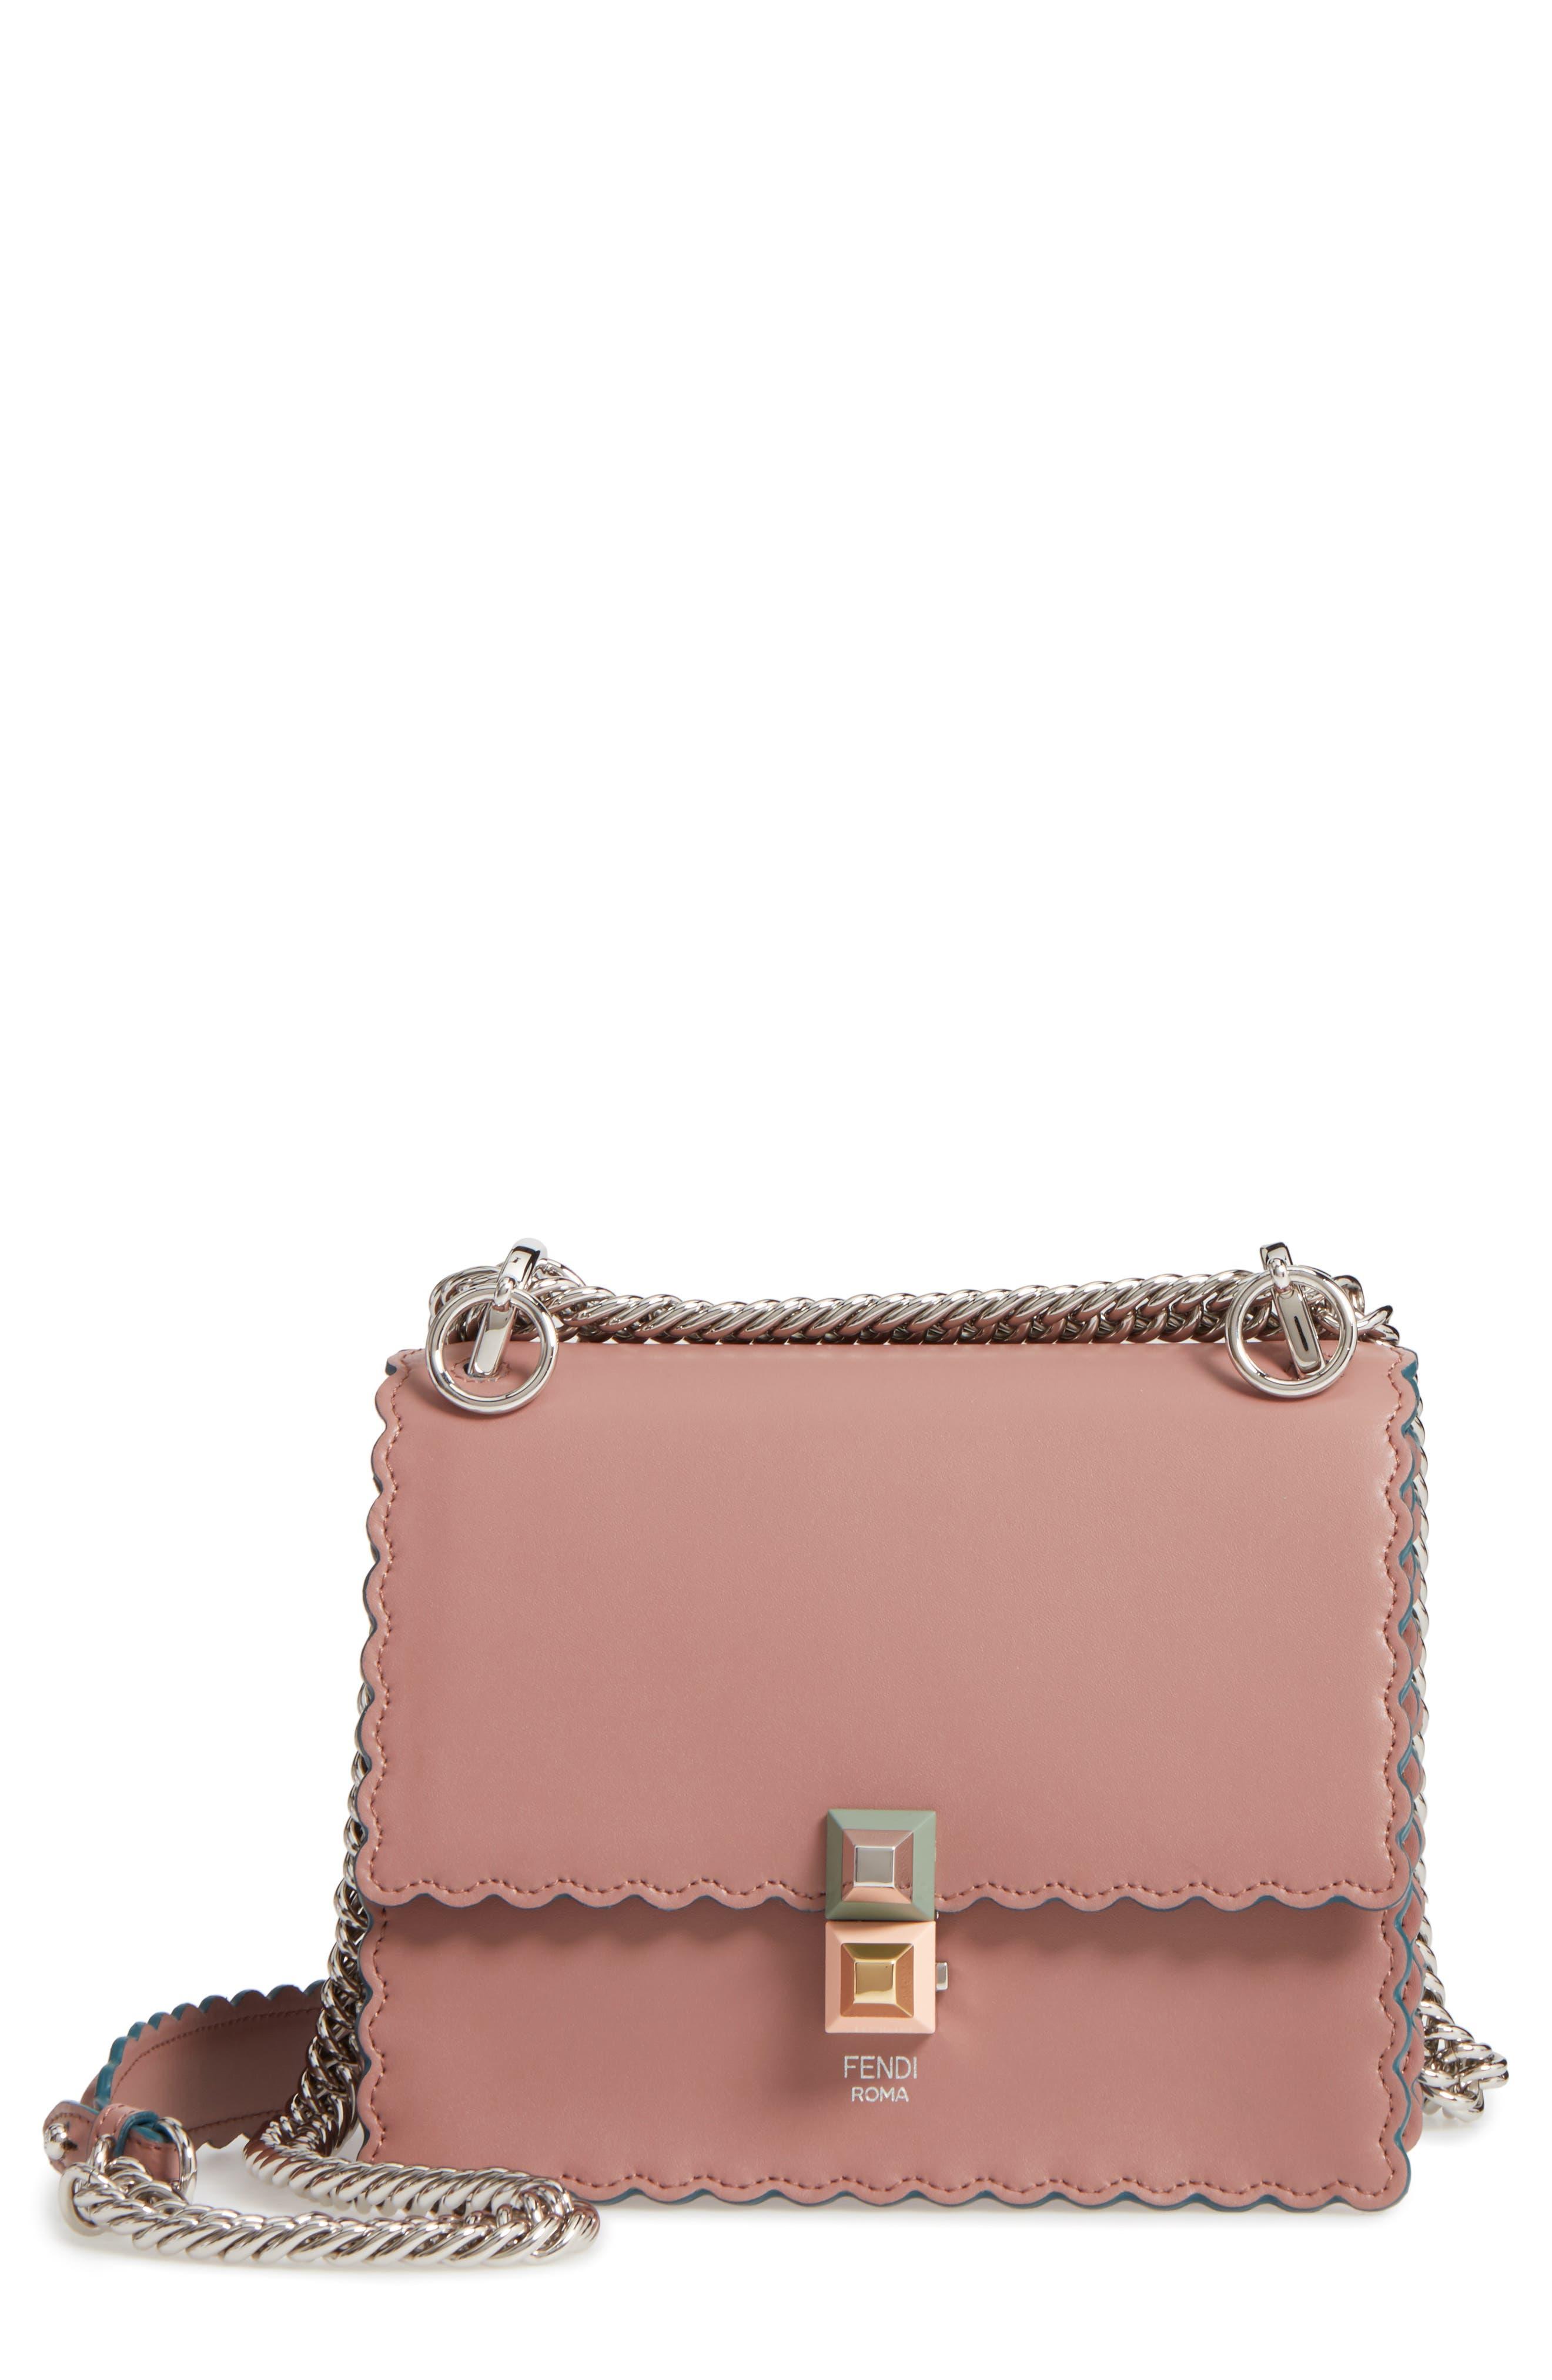 Fendi Small Kan I Scallop Leather Shoulder Bag